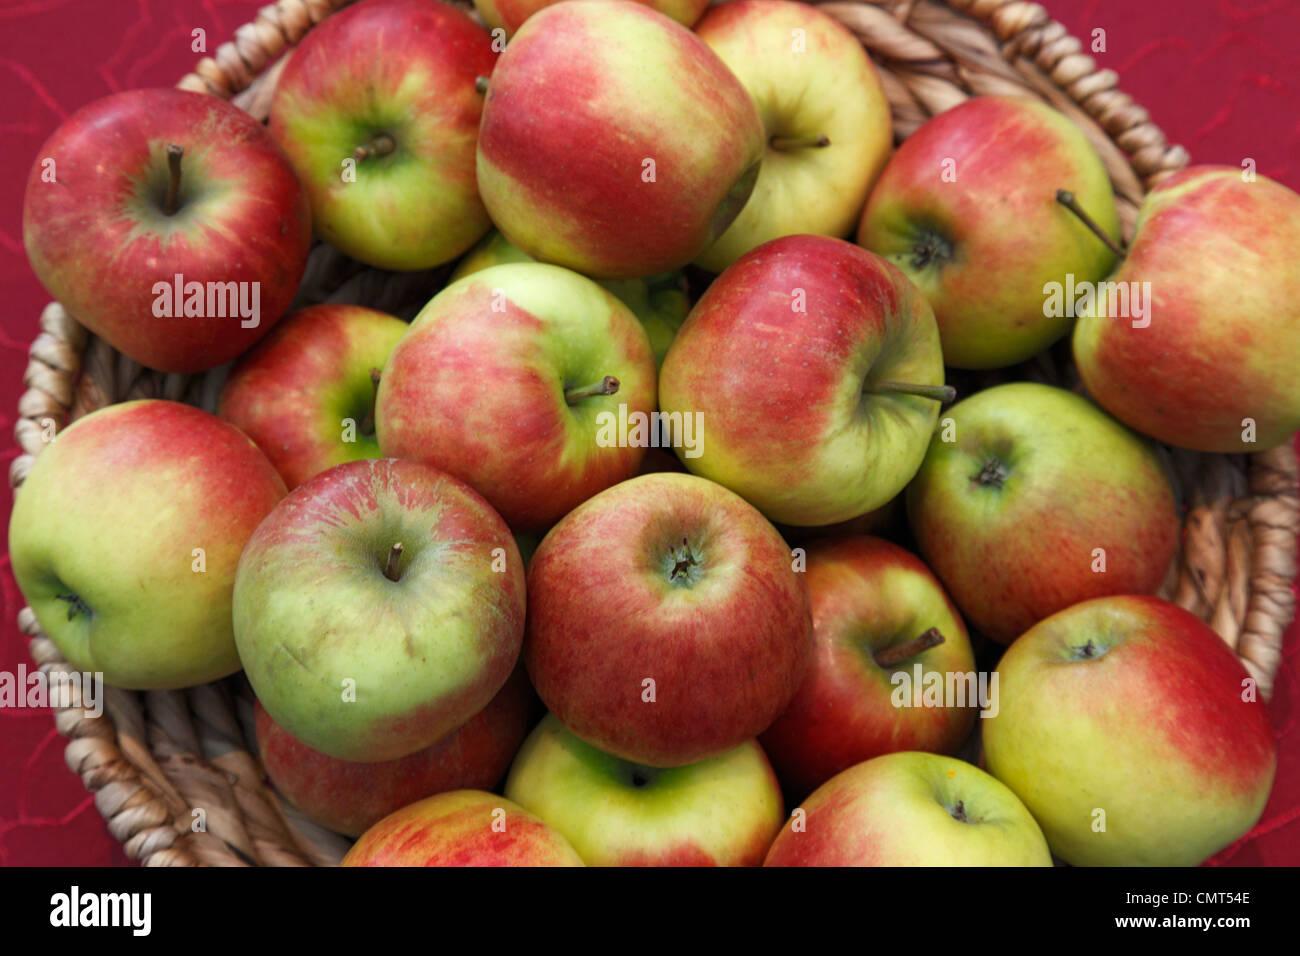 foodstuffs, fruit, pipfruit, apples in a basket, Malus domestica, Berlepsch Stock Photo